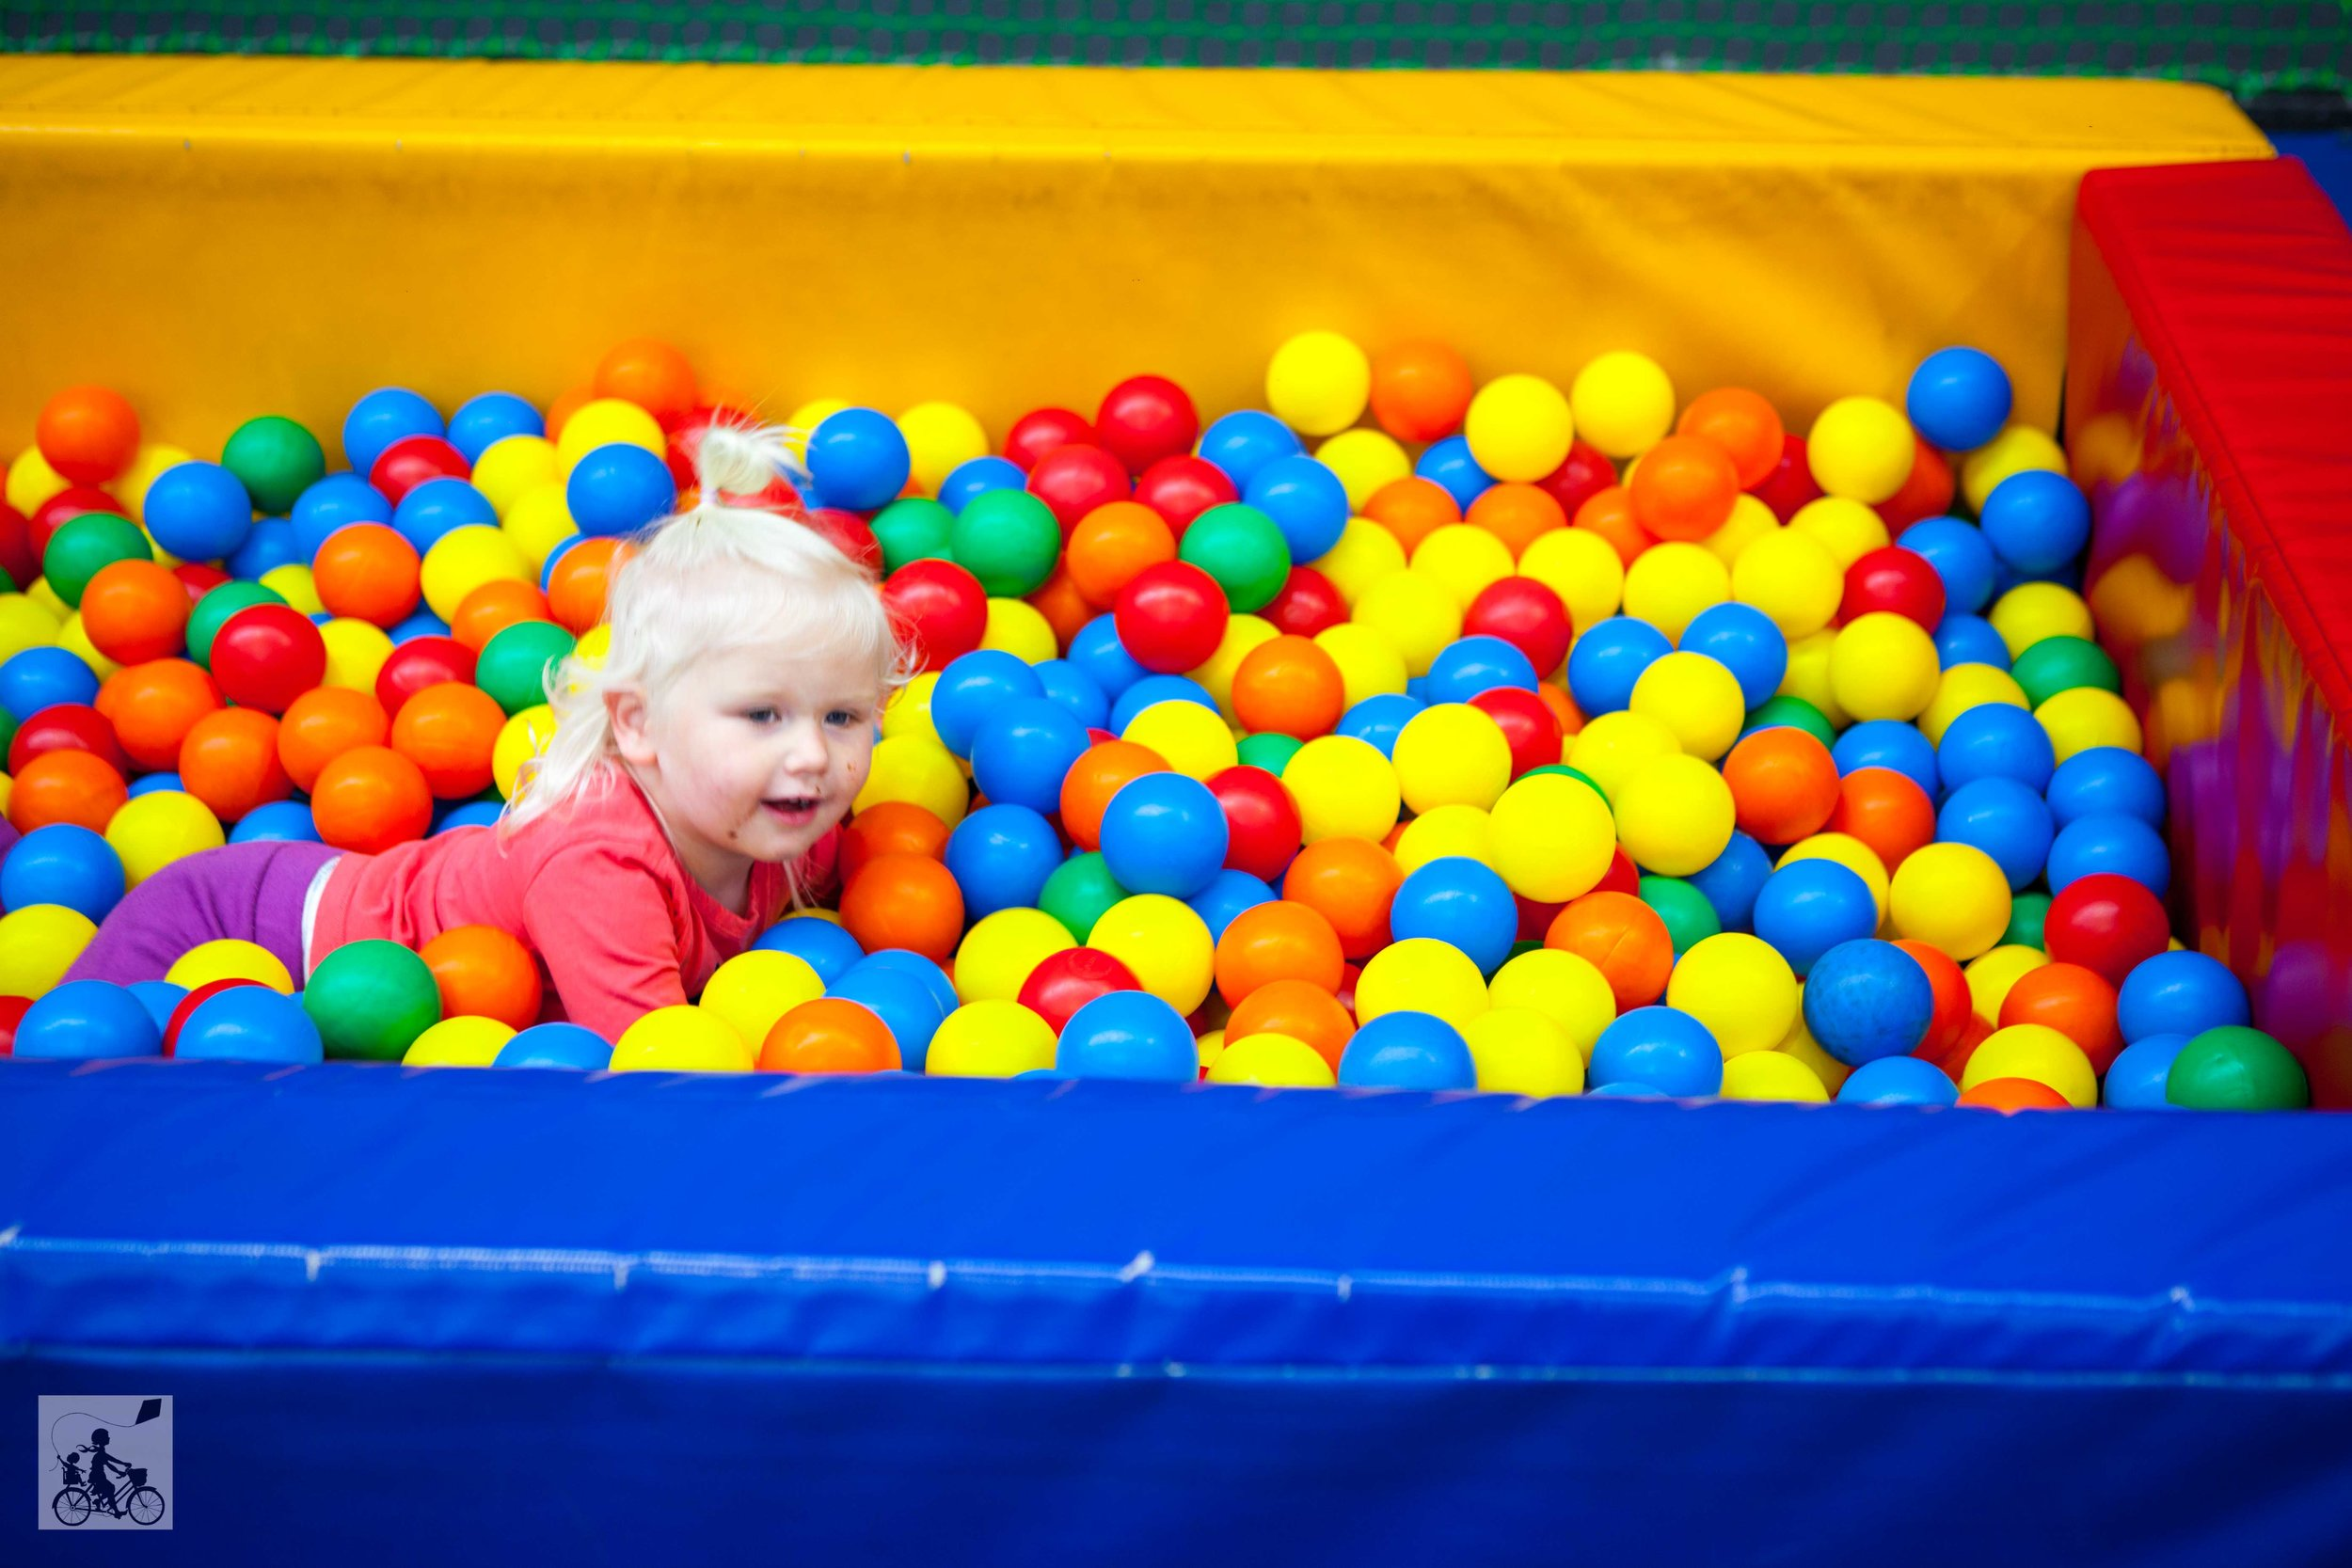 Playdays, Sandringham